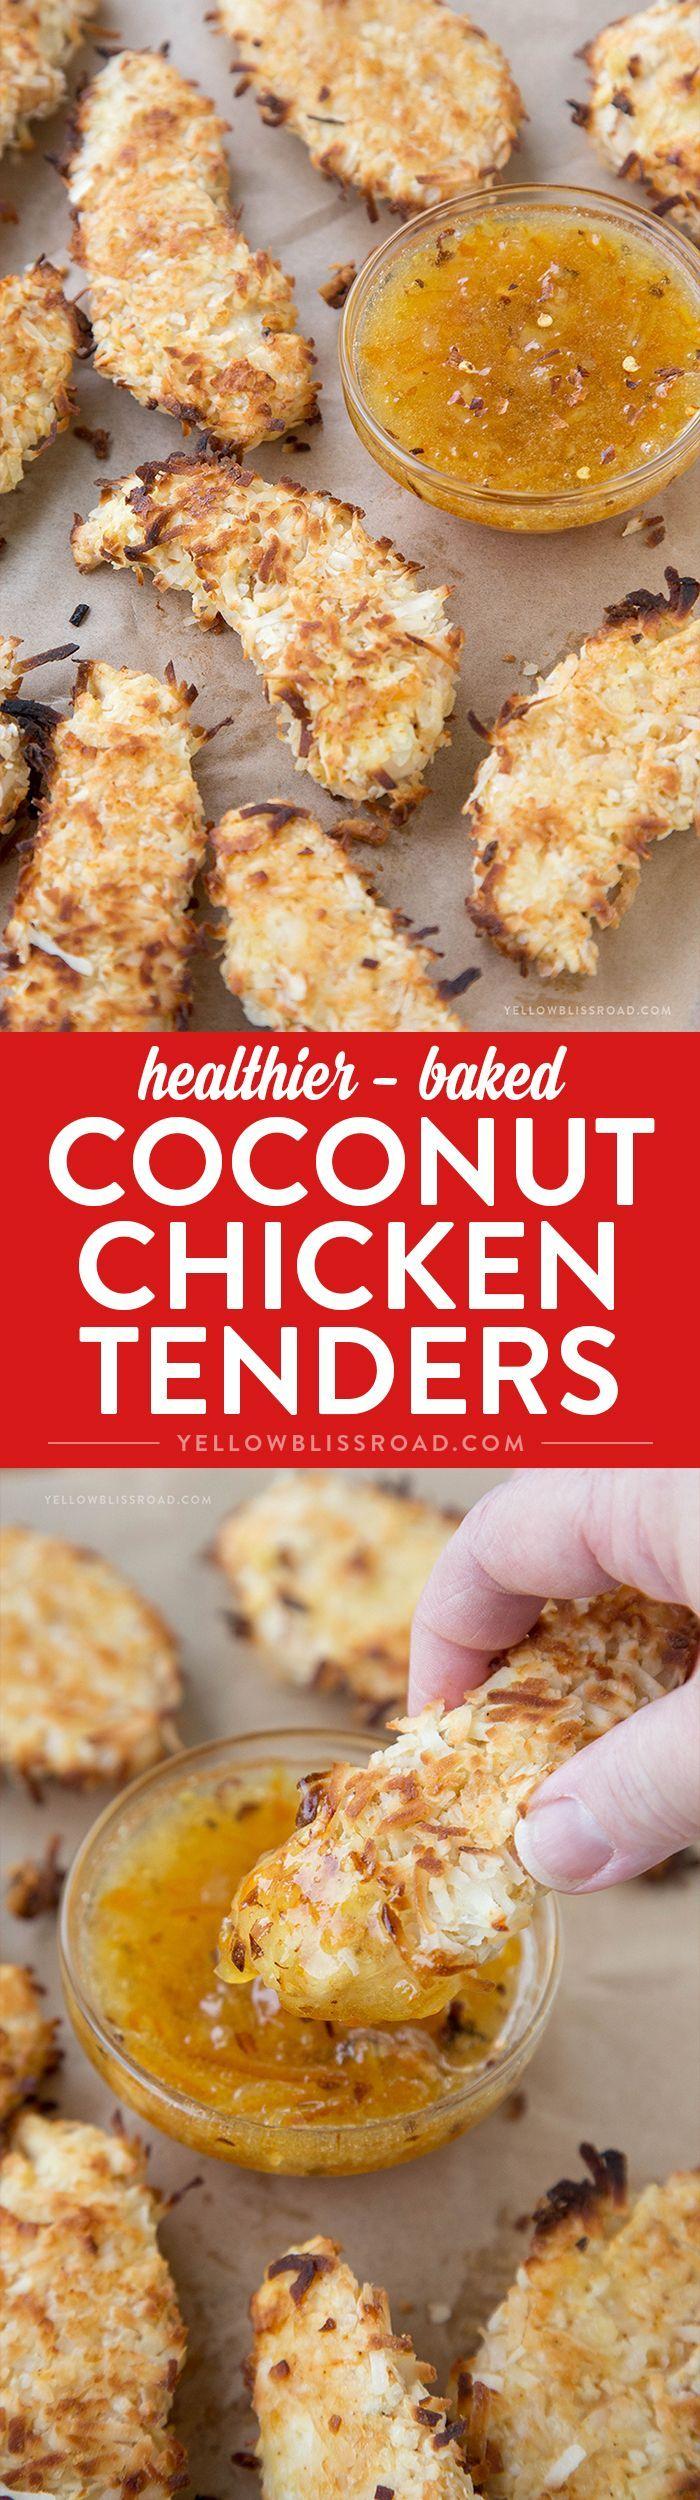 ... Coconut Chicken on Pinterest | Coconut Chicken Tenders, Chicken and